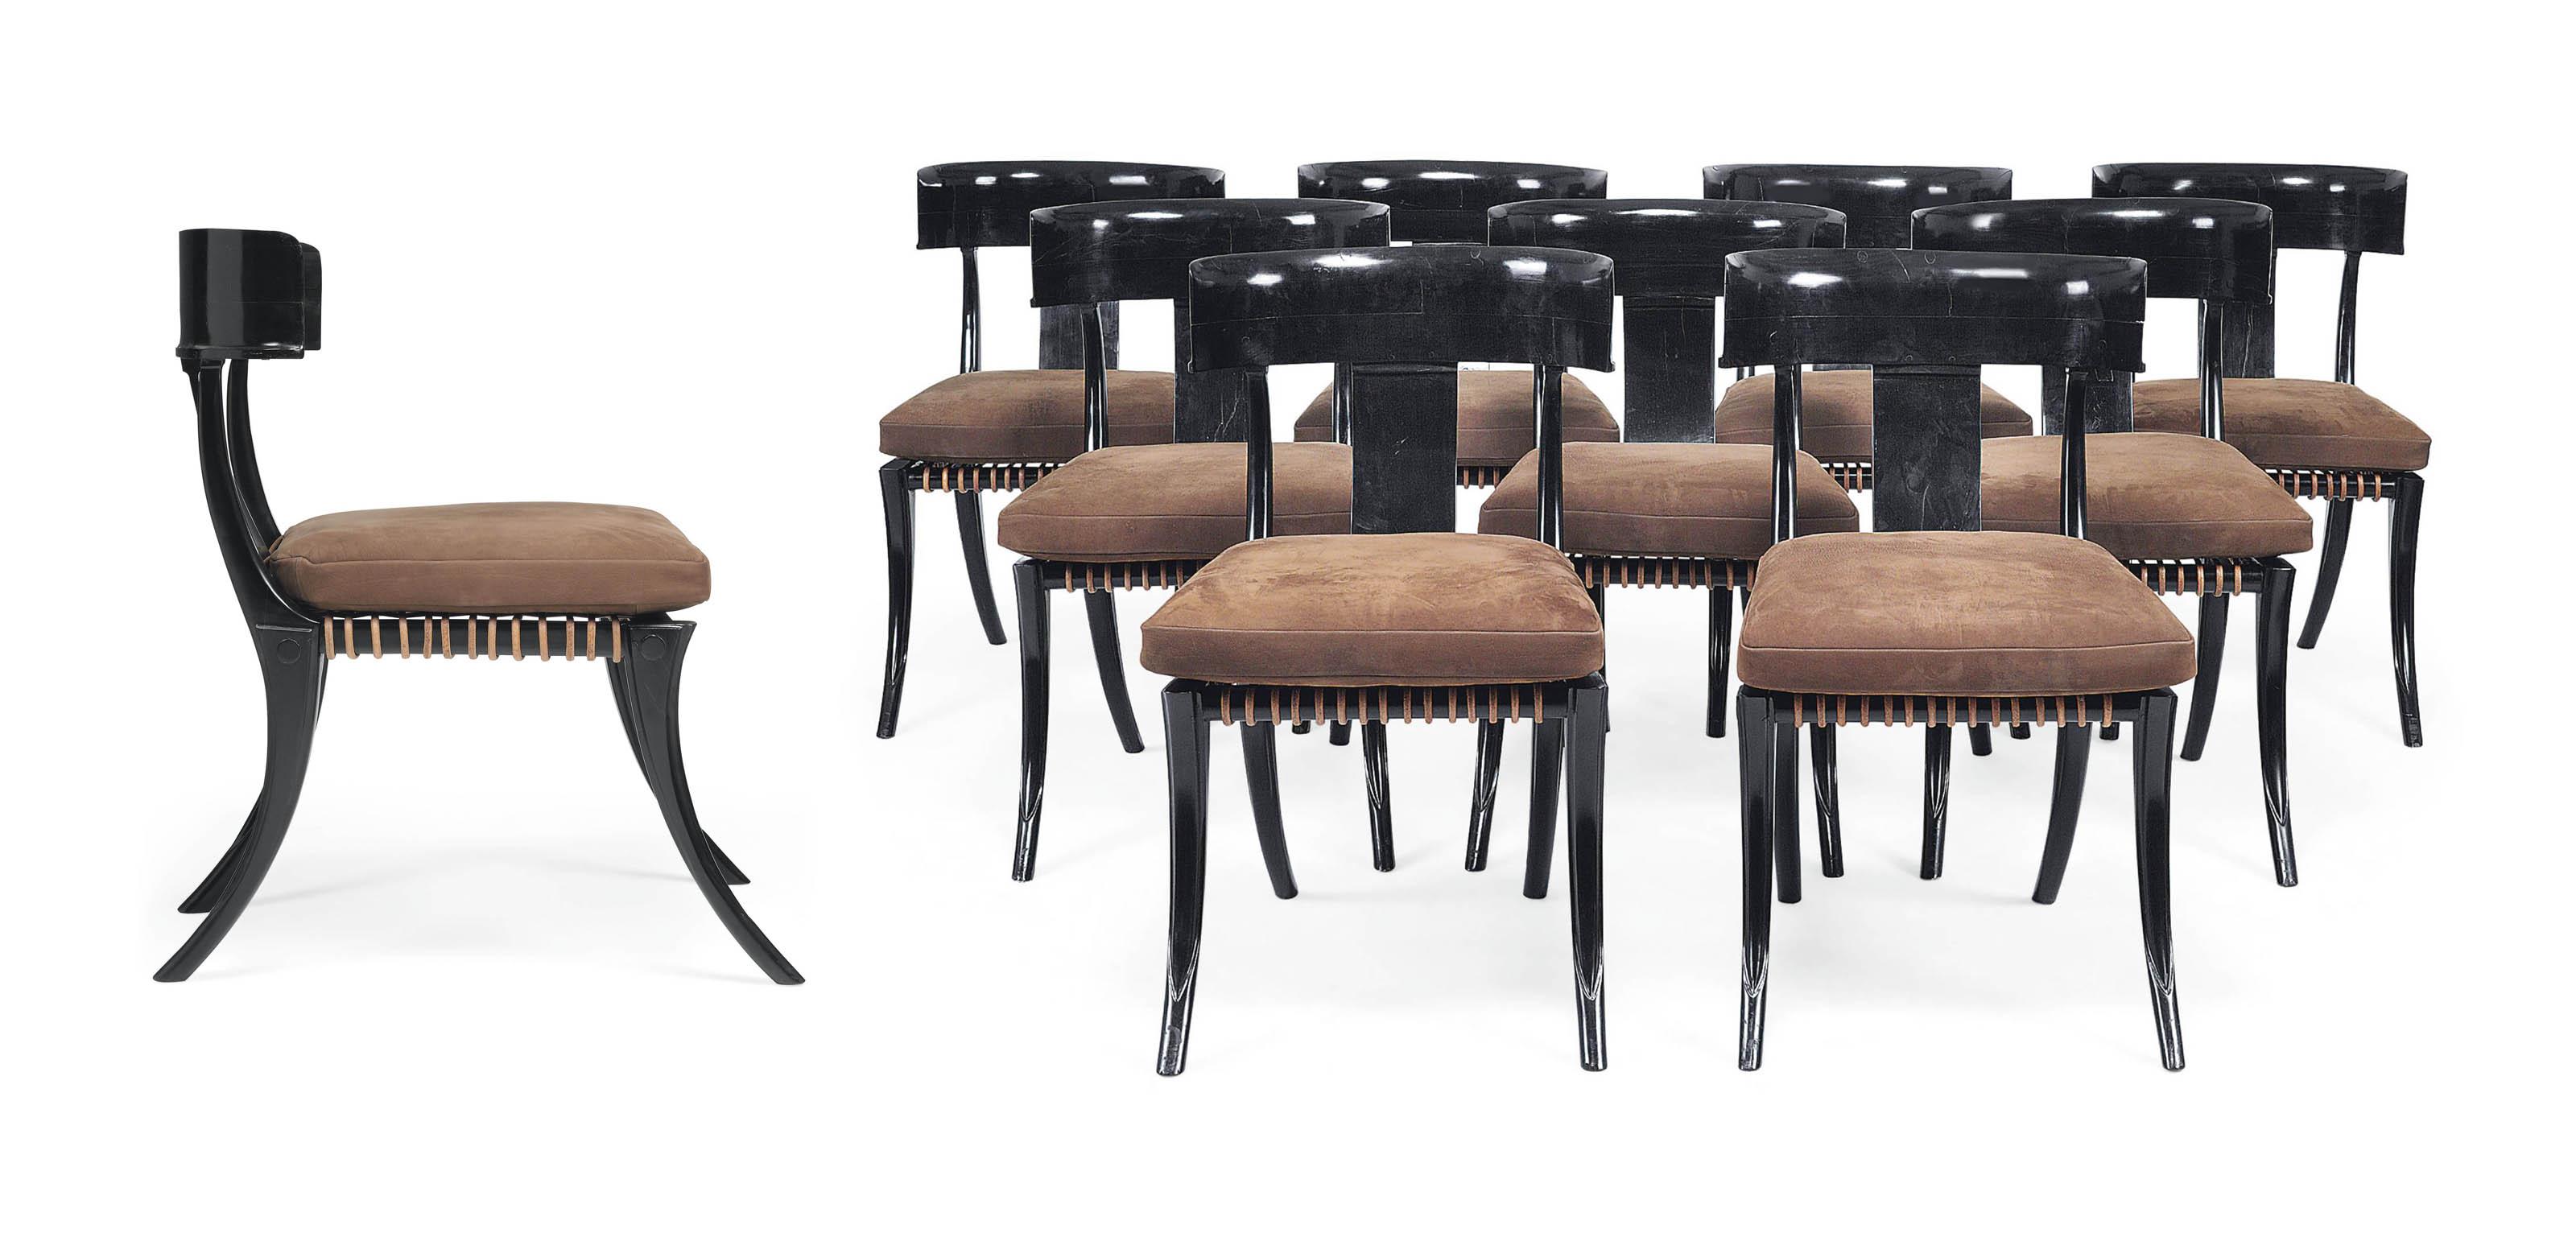 A SET OF TWELVE EBONY 'KLISMOS' DINING CHAIRS